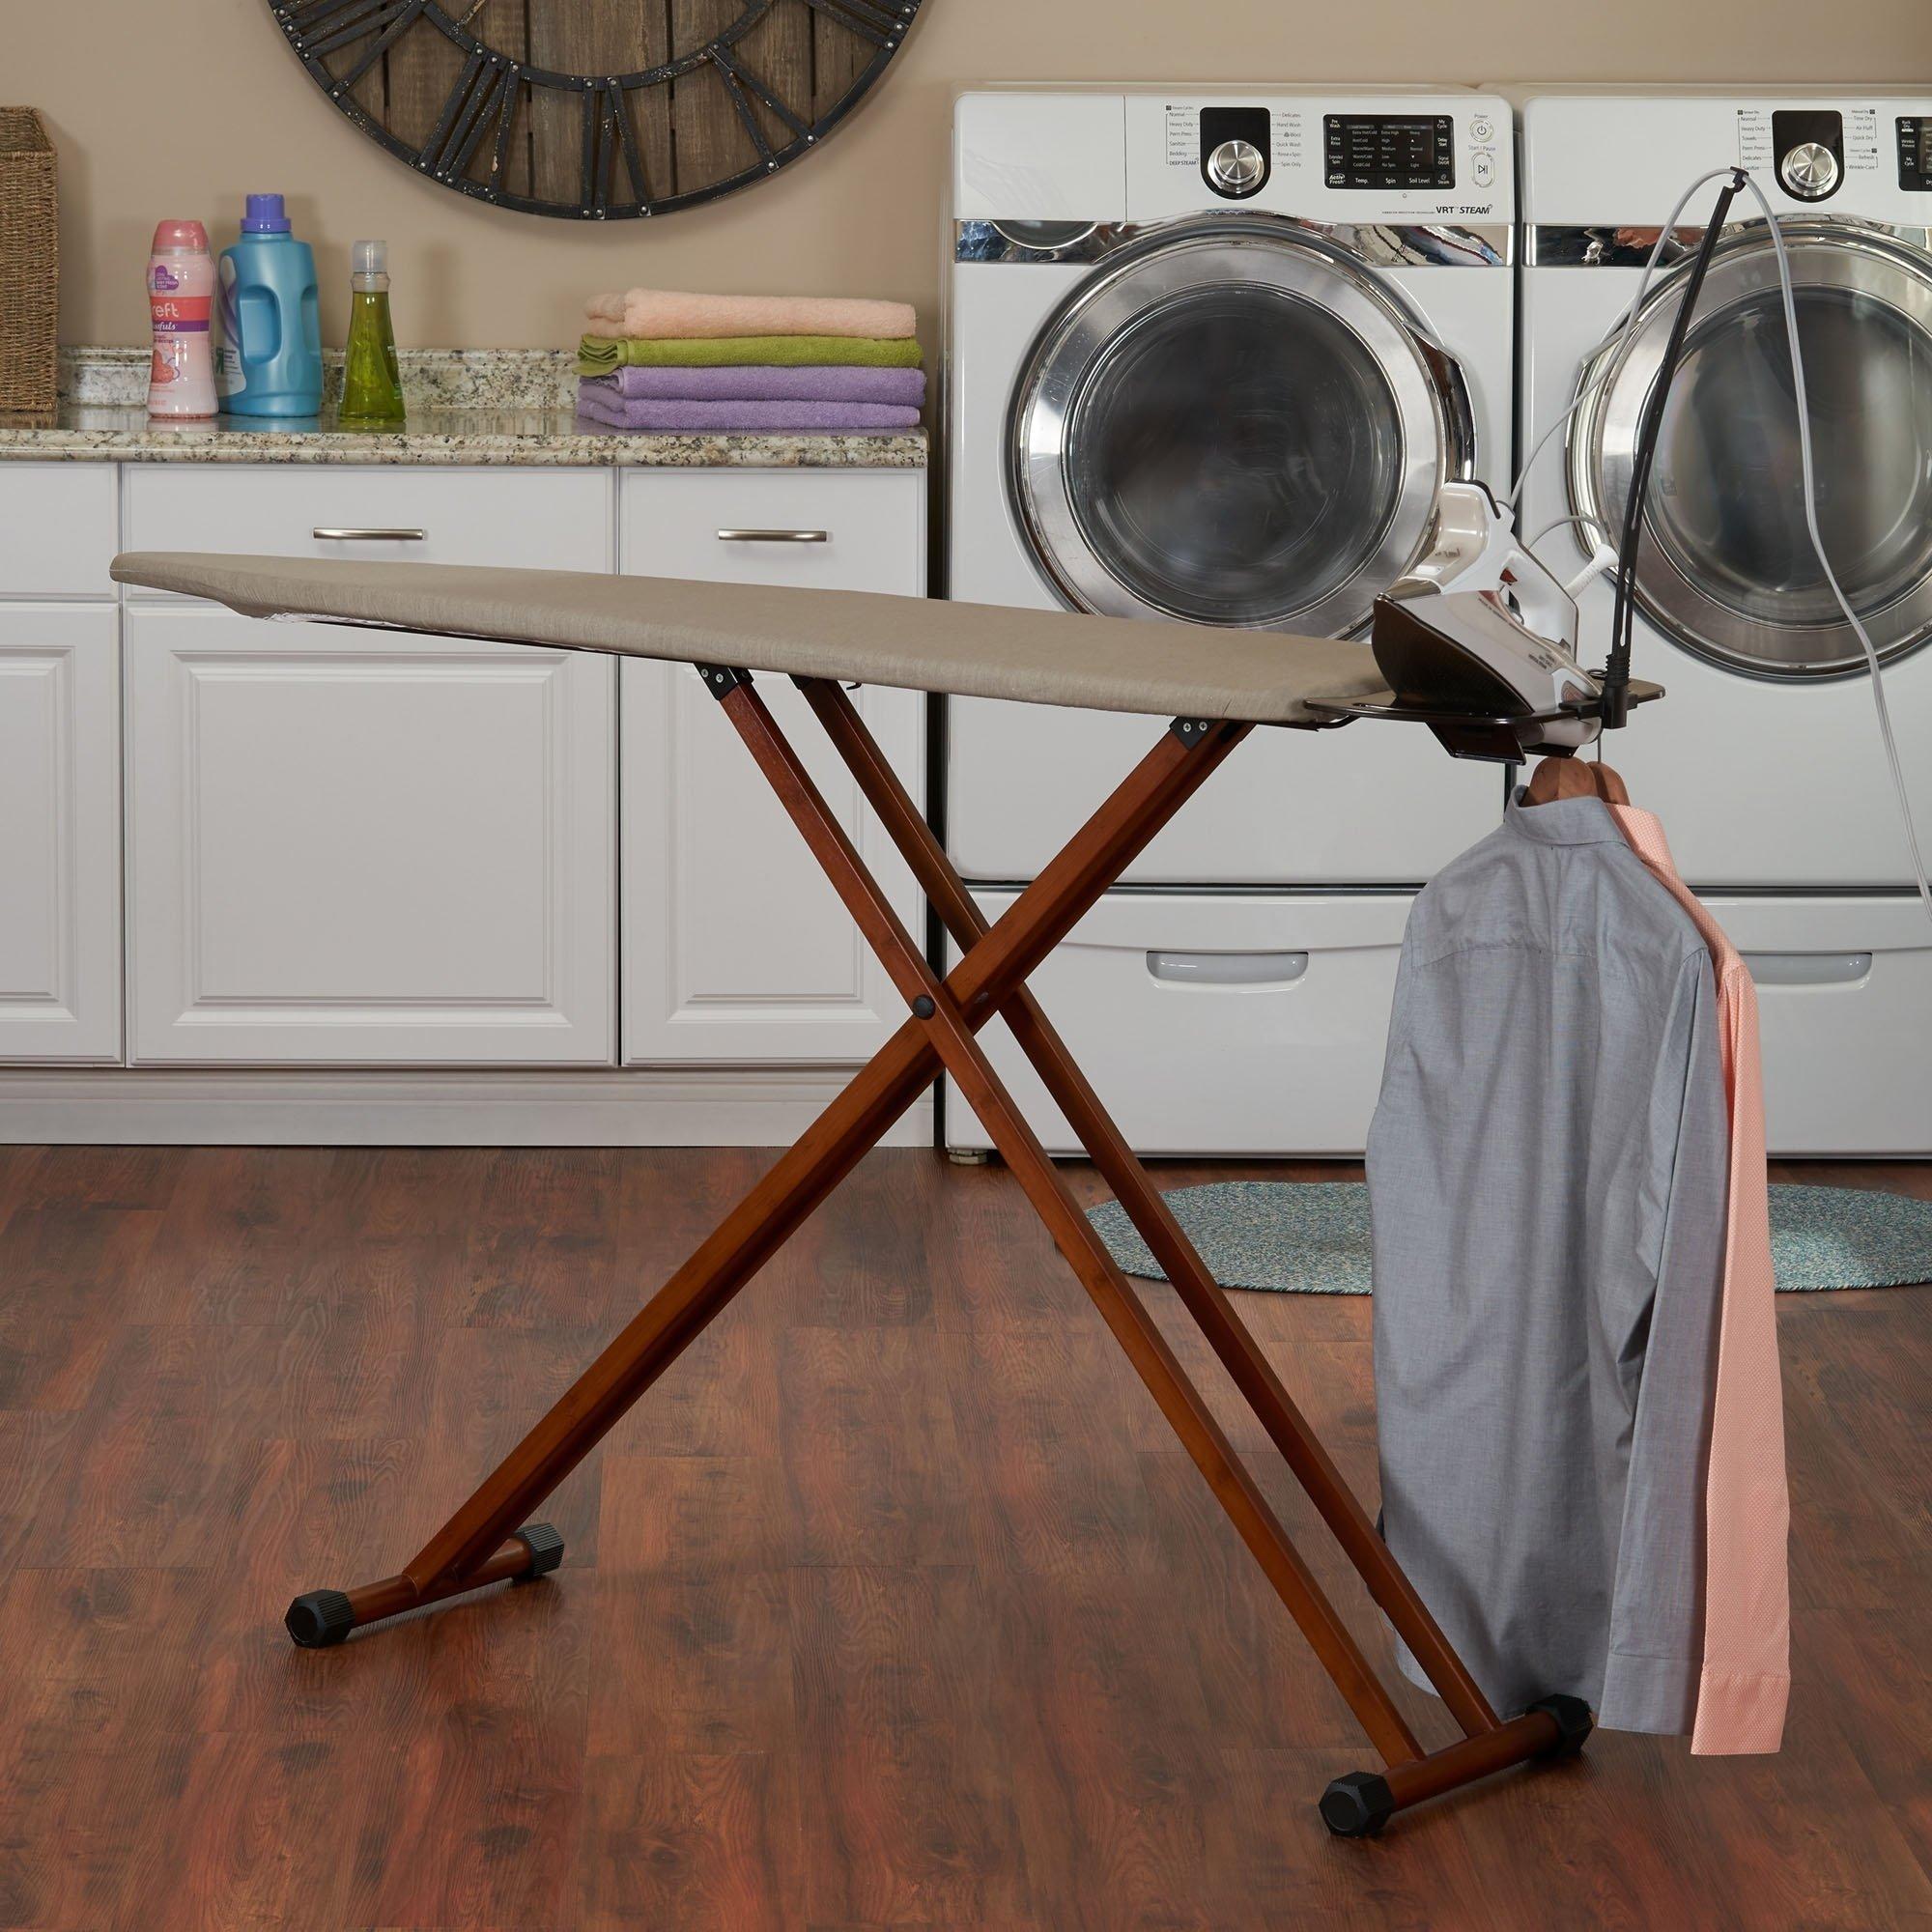 MattsGlobal Bamboo Leg Ironing Board with Iron Rest Cotton Wood Free Standing Iron Holder Dark Frame by MattsGlobal (Image #4)